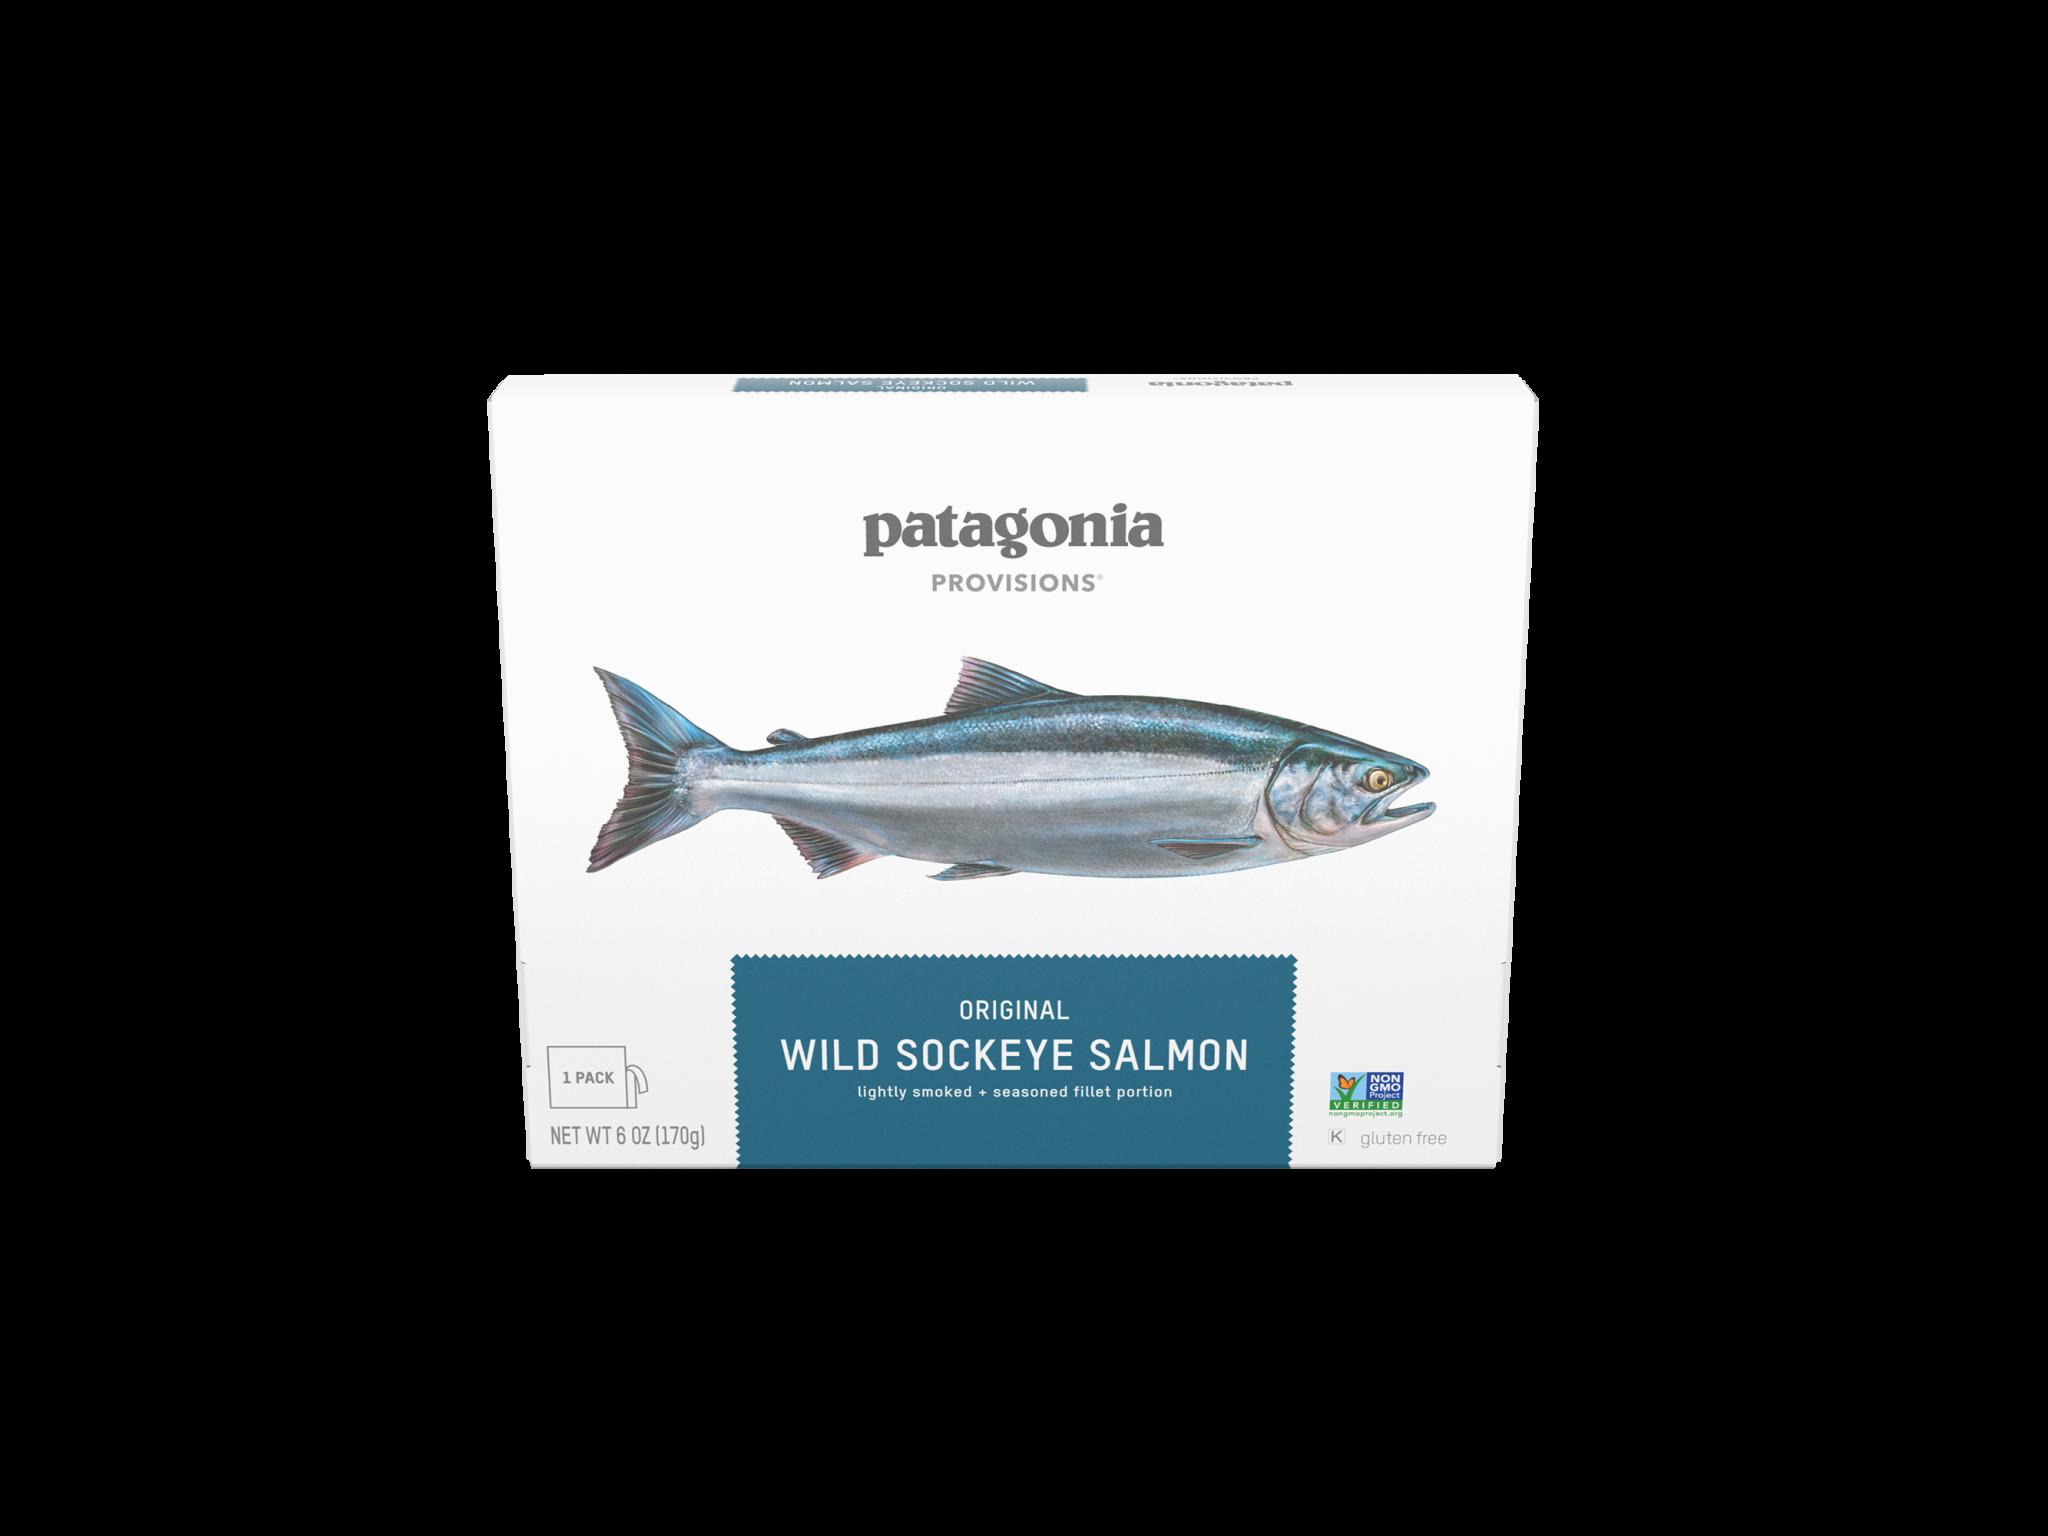 Patagonia Provisions Patagonia Provisions Salmon